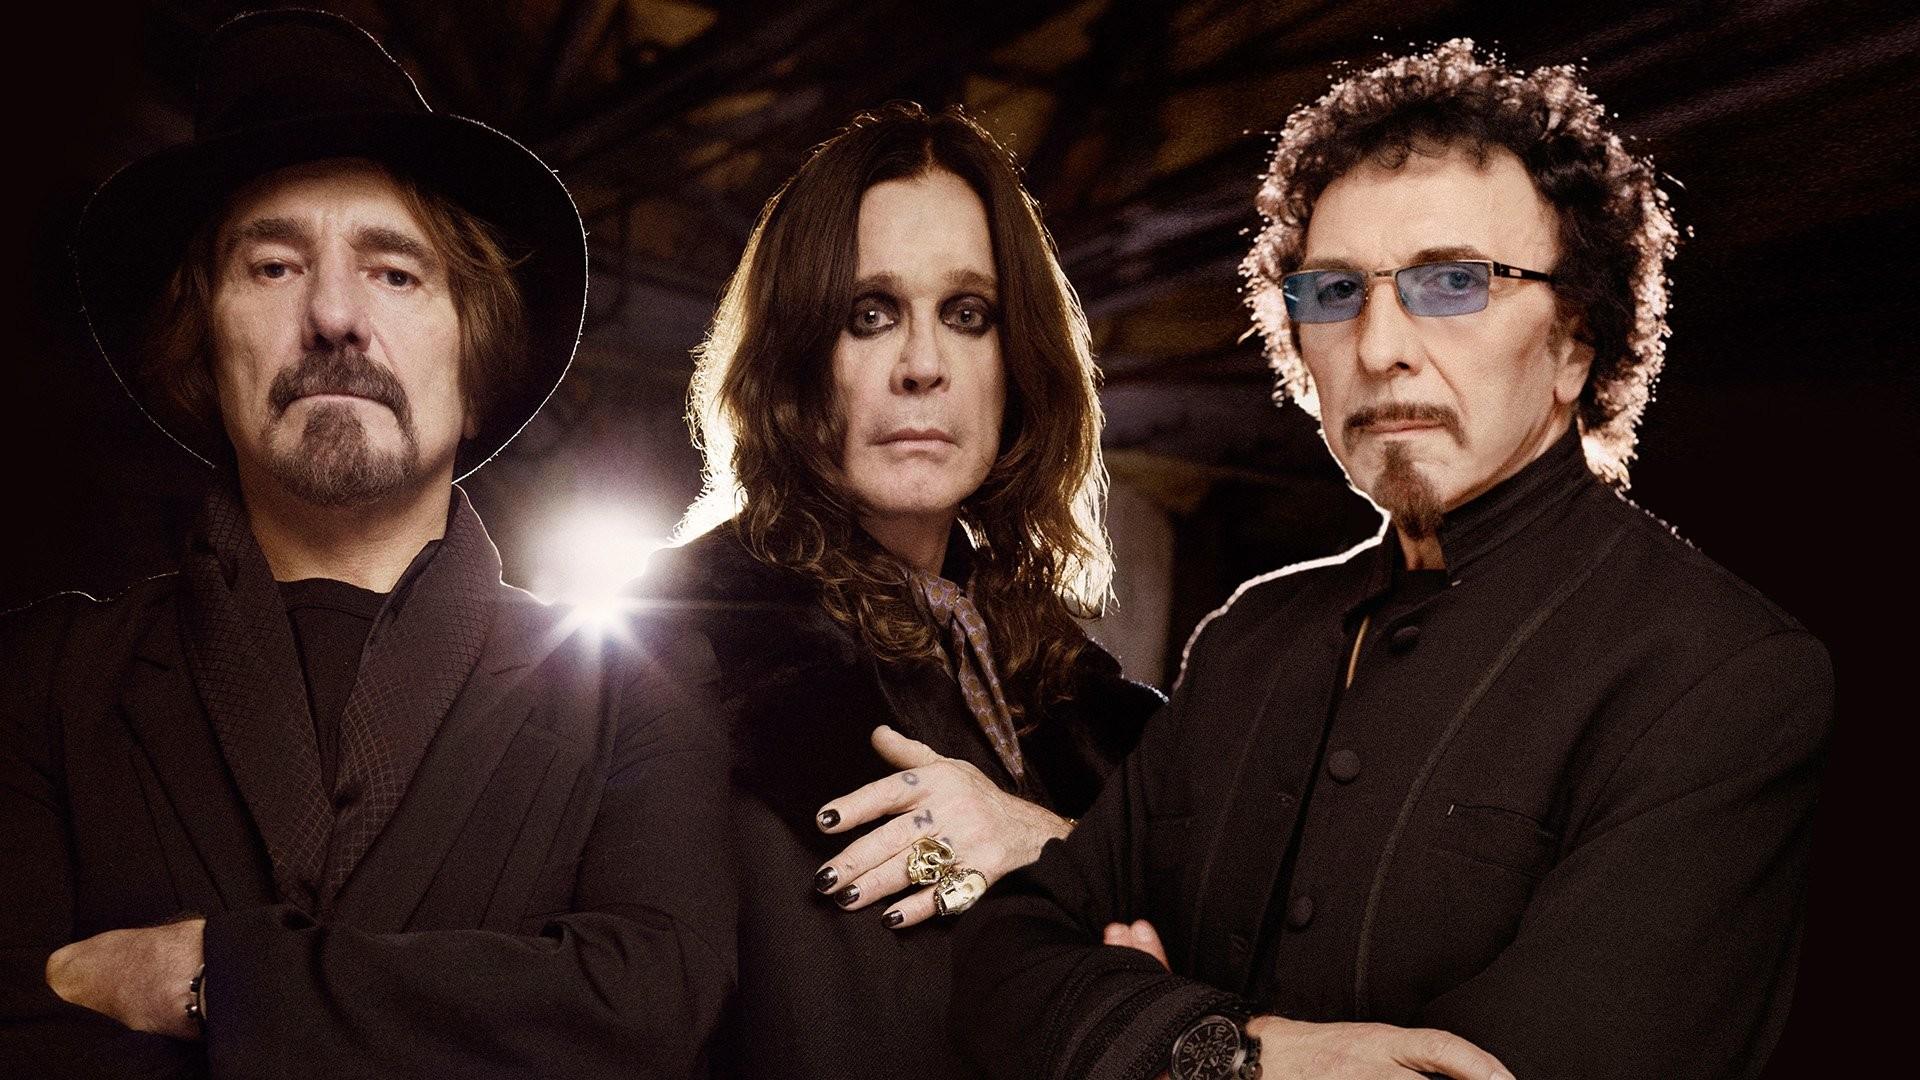 Music – Black Sabbath Ozzy Osbourne Heavy Metal Wallpaper